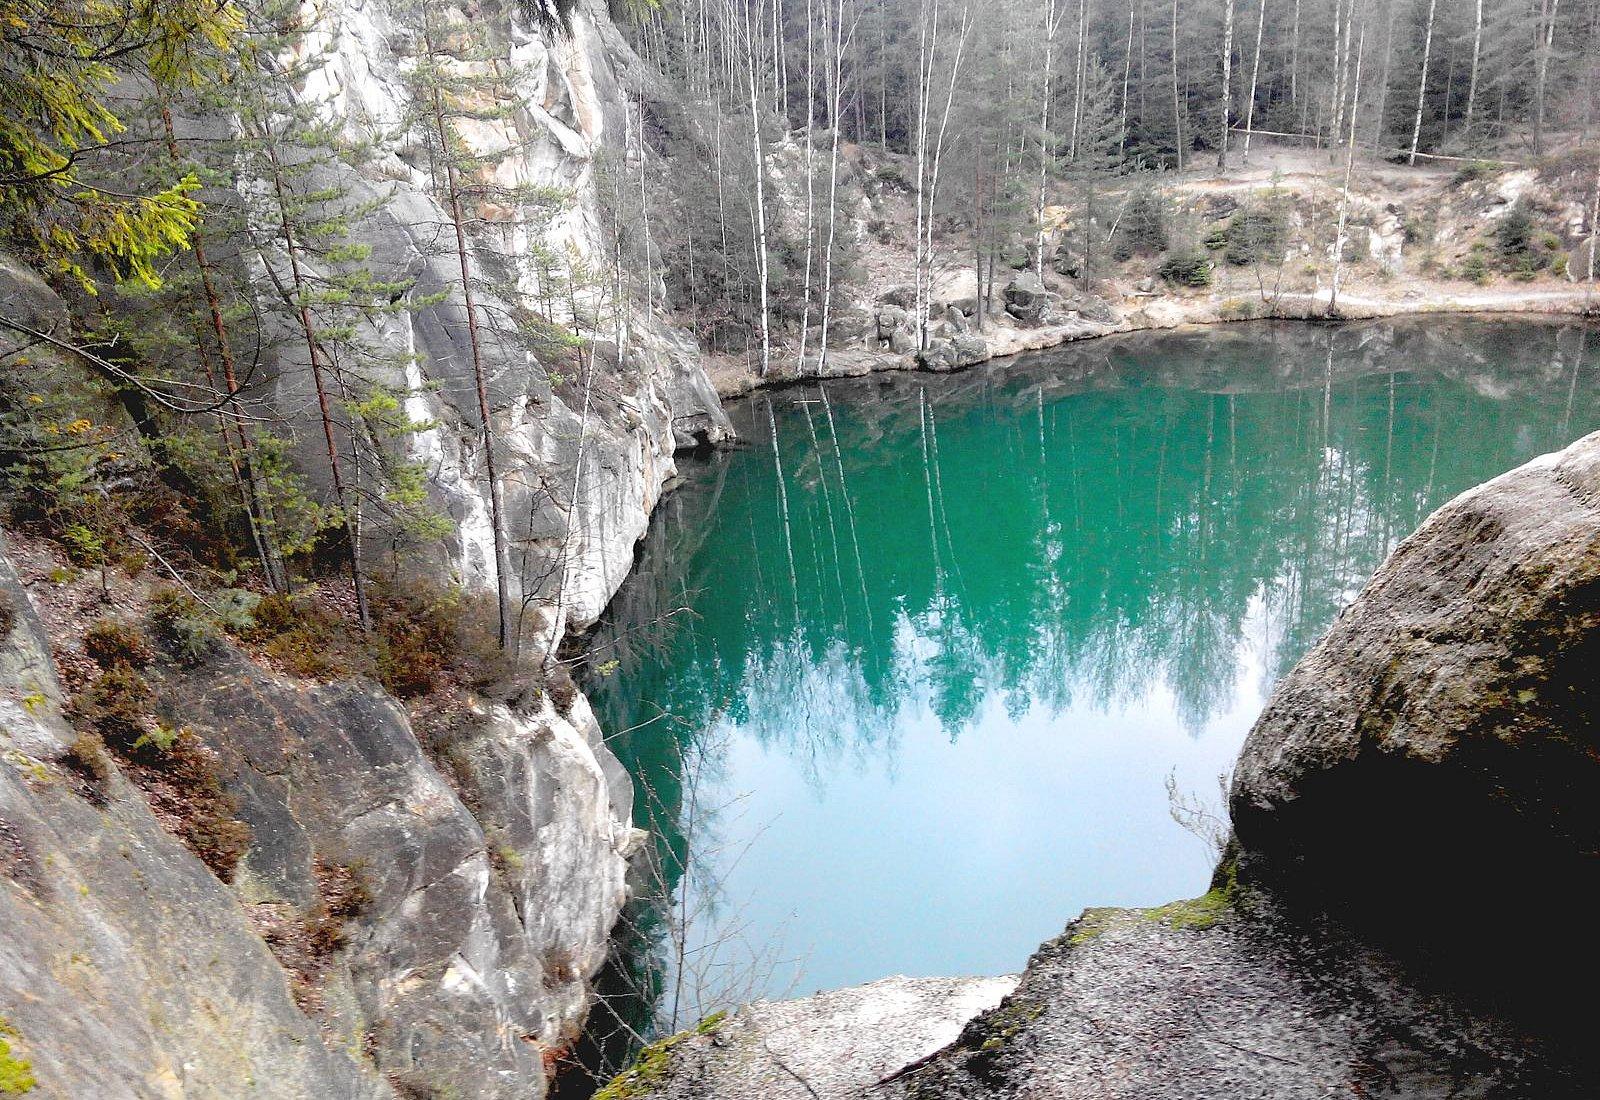 Озеро в окружении леса.